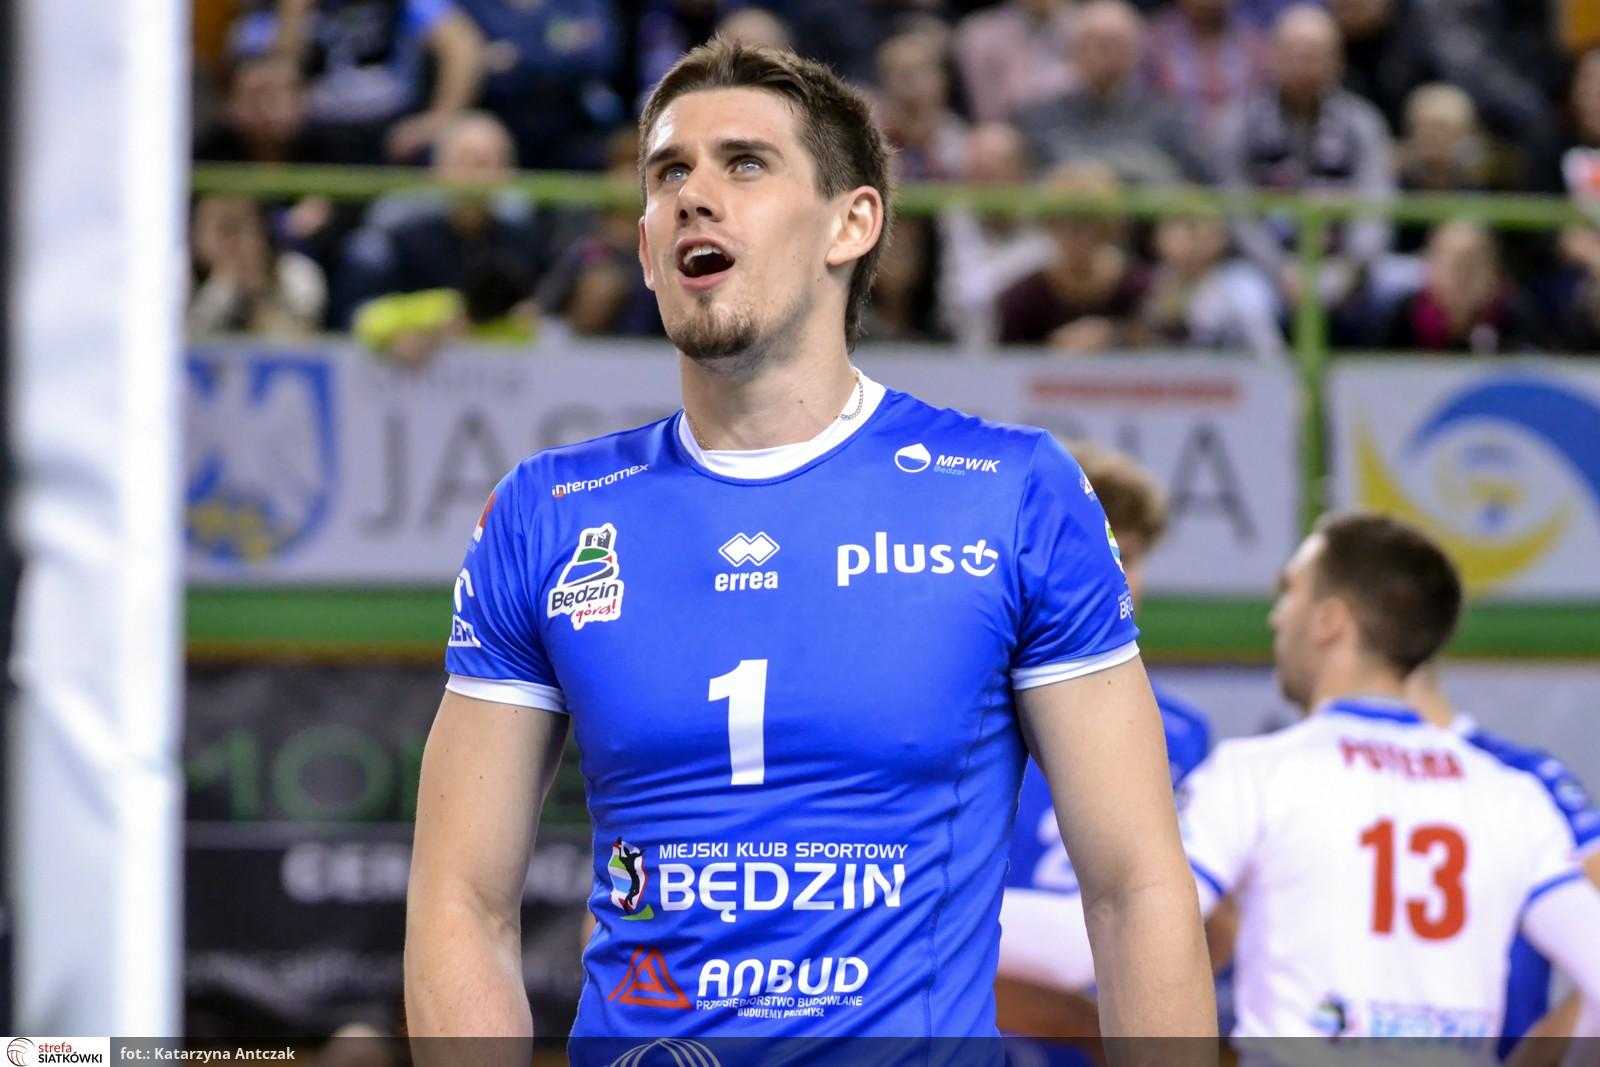 08 - Marcin Waliński